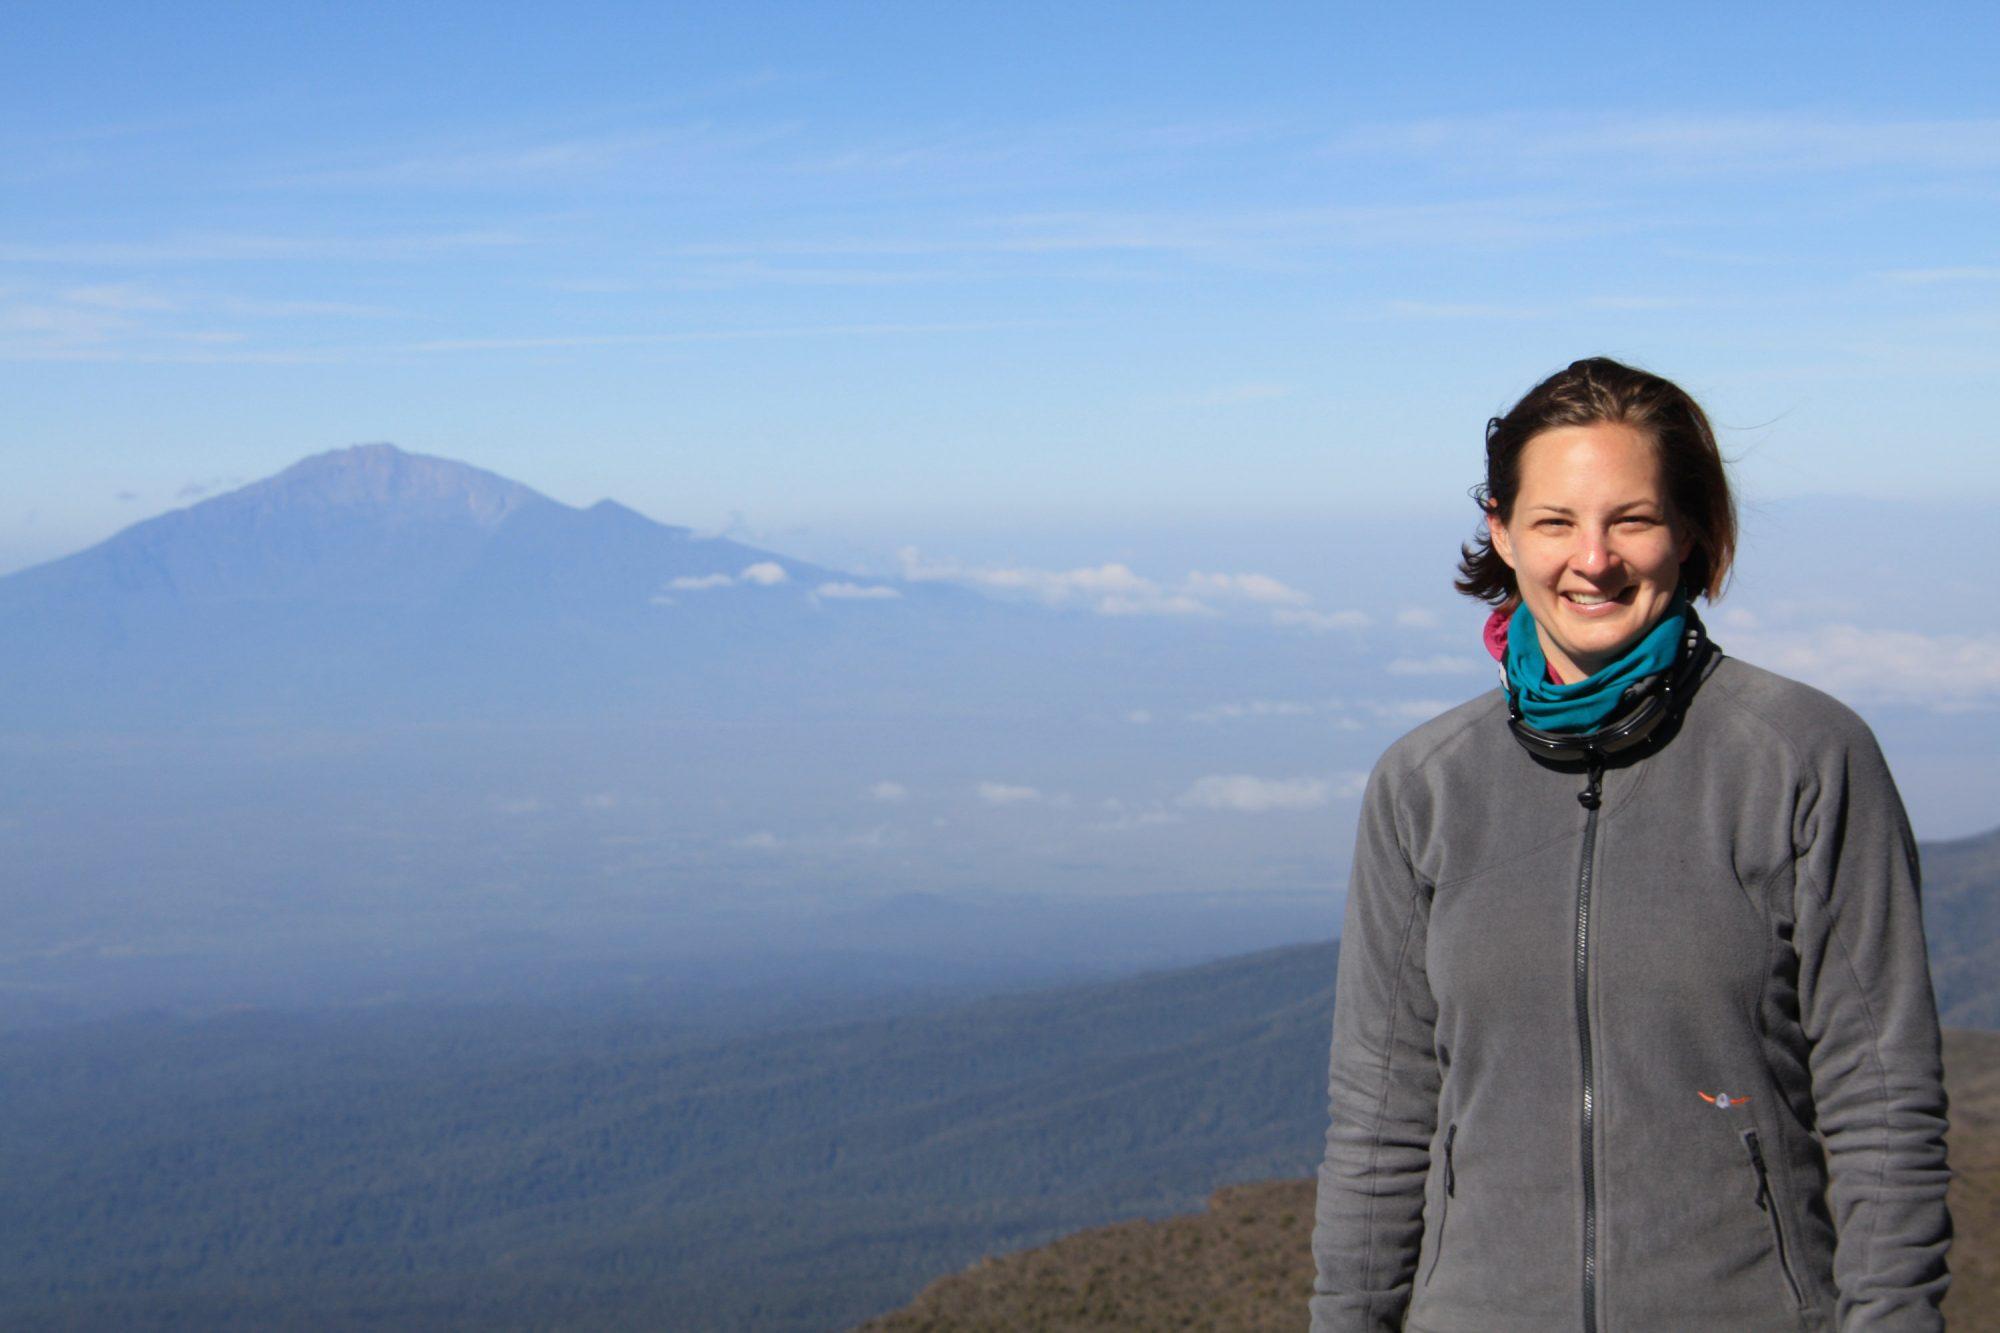 Blick Mount Meru, Kilimandscharo, Kilimandscharo besteigen, Tansania, Afrika, Kilimandscharo Tour, Erfahrungsbericht, Machame Route